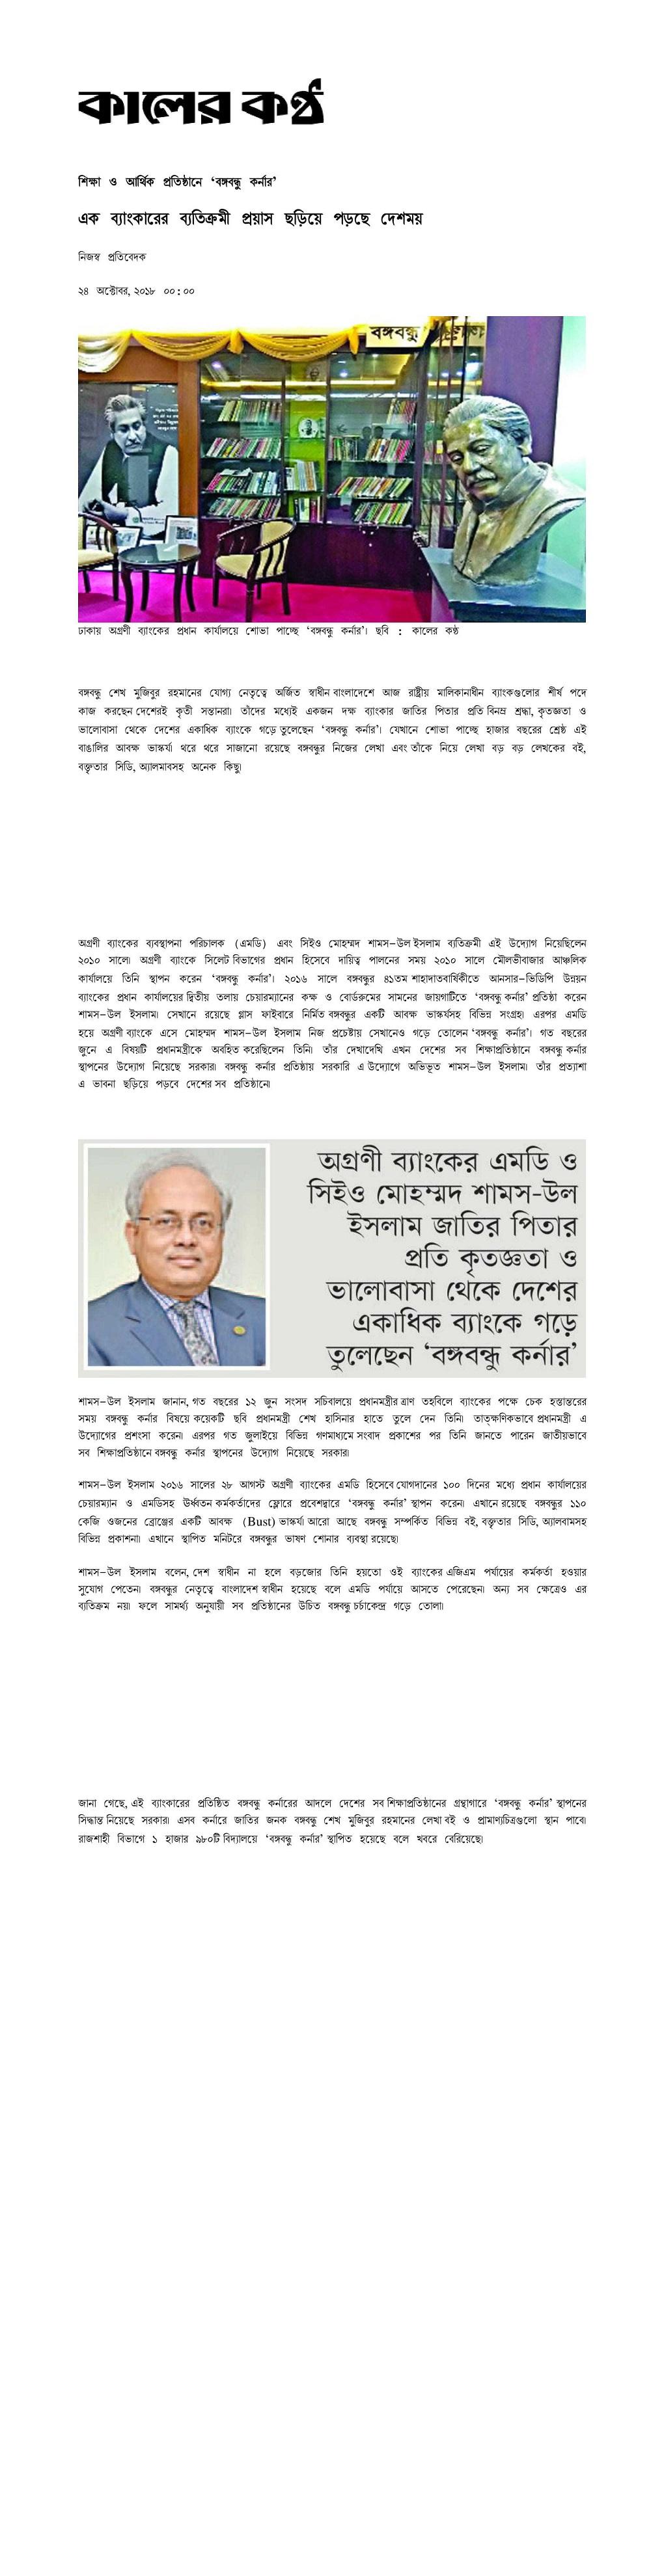 Interview of MD & CEO about Bangabandhu Corner(Kaler kantha)